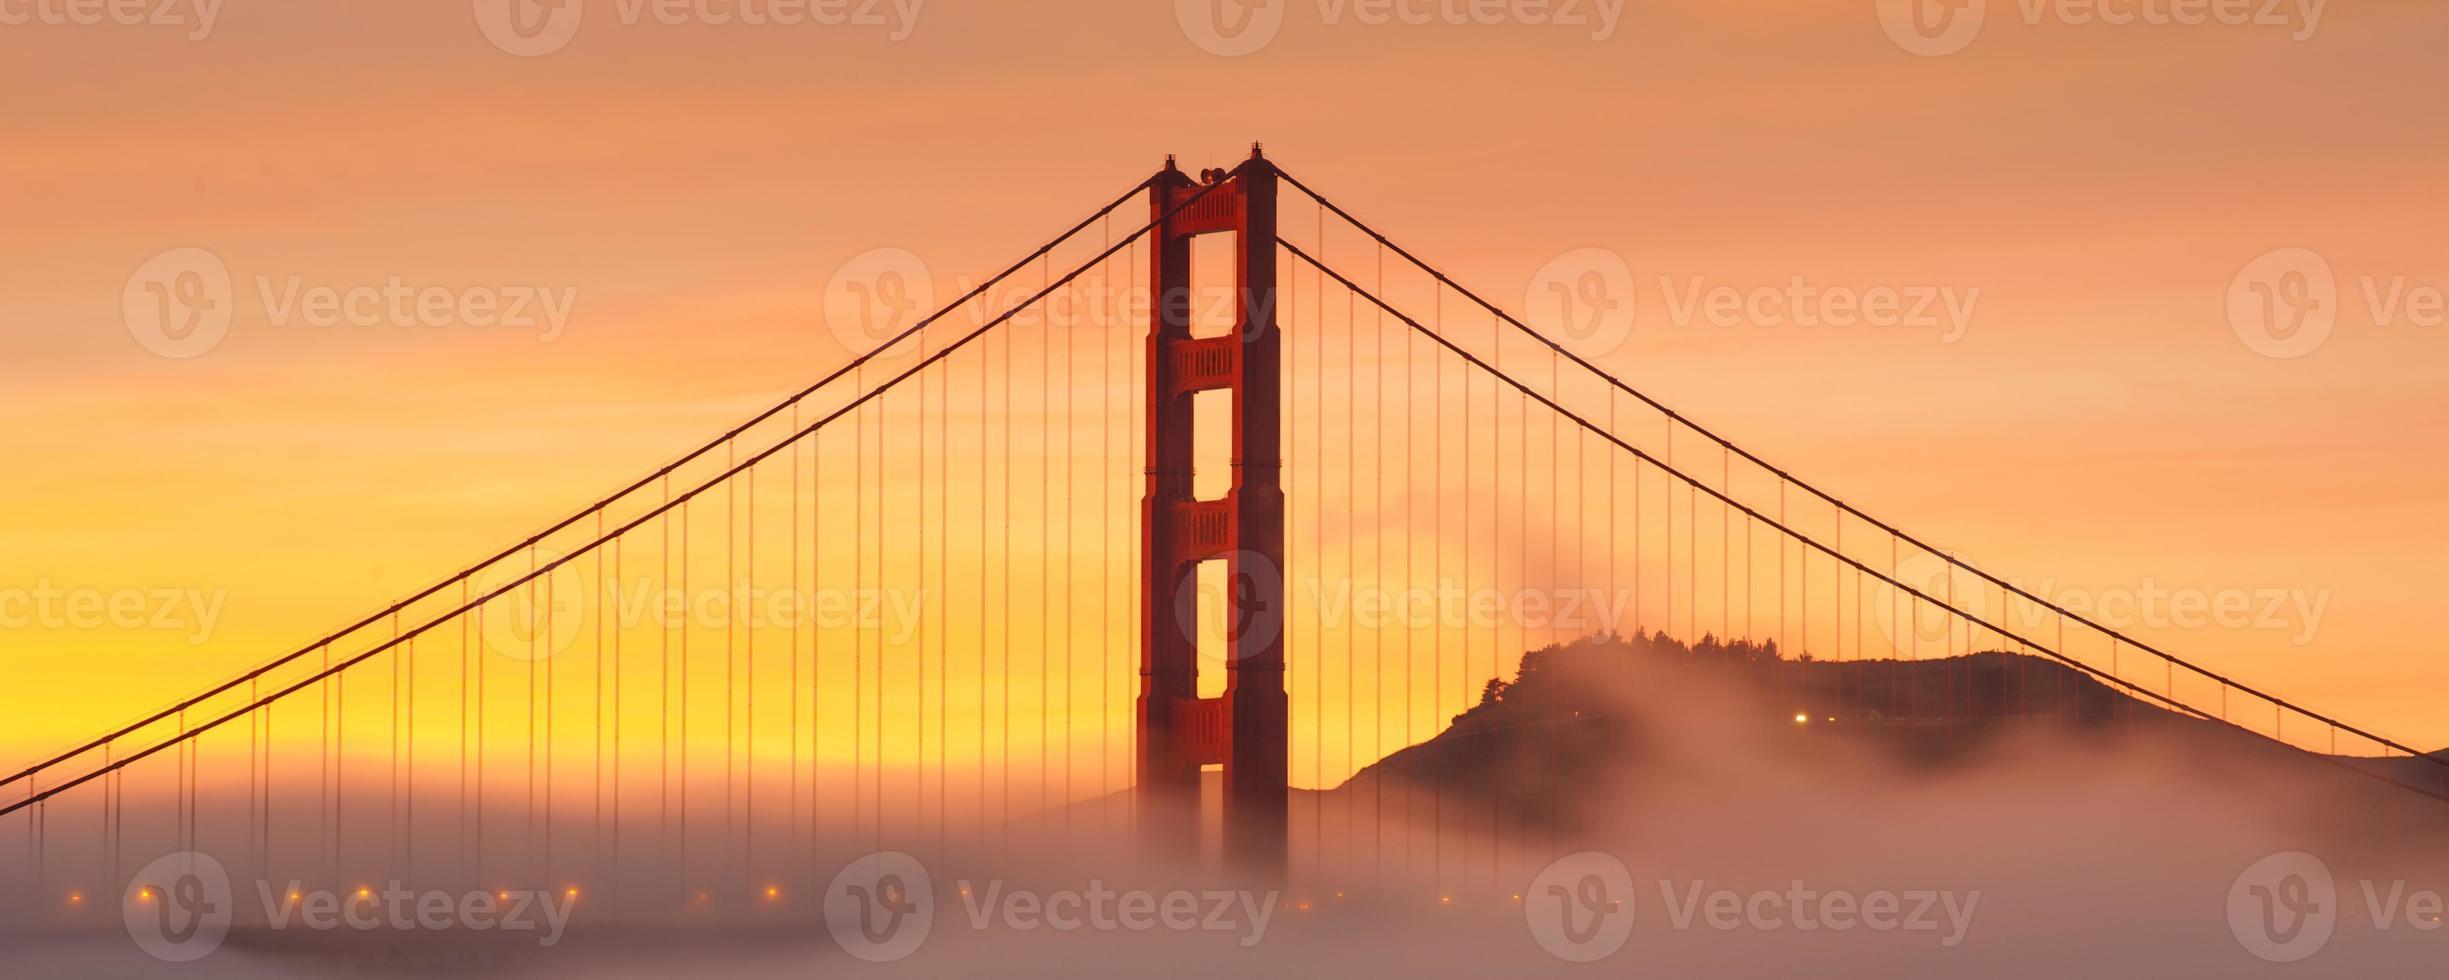 puente Golden Gate al amanecer foto